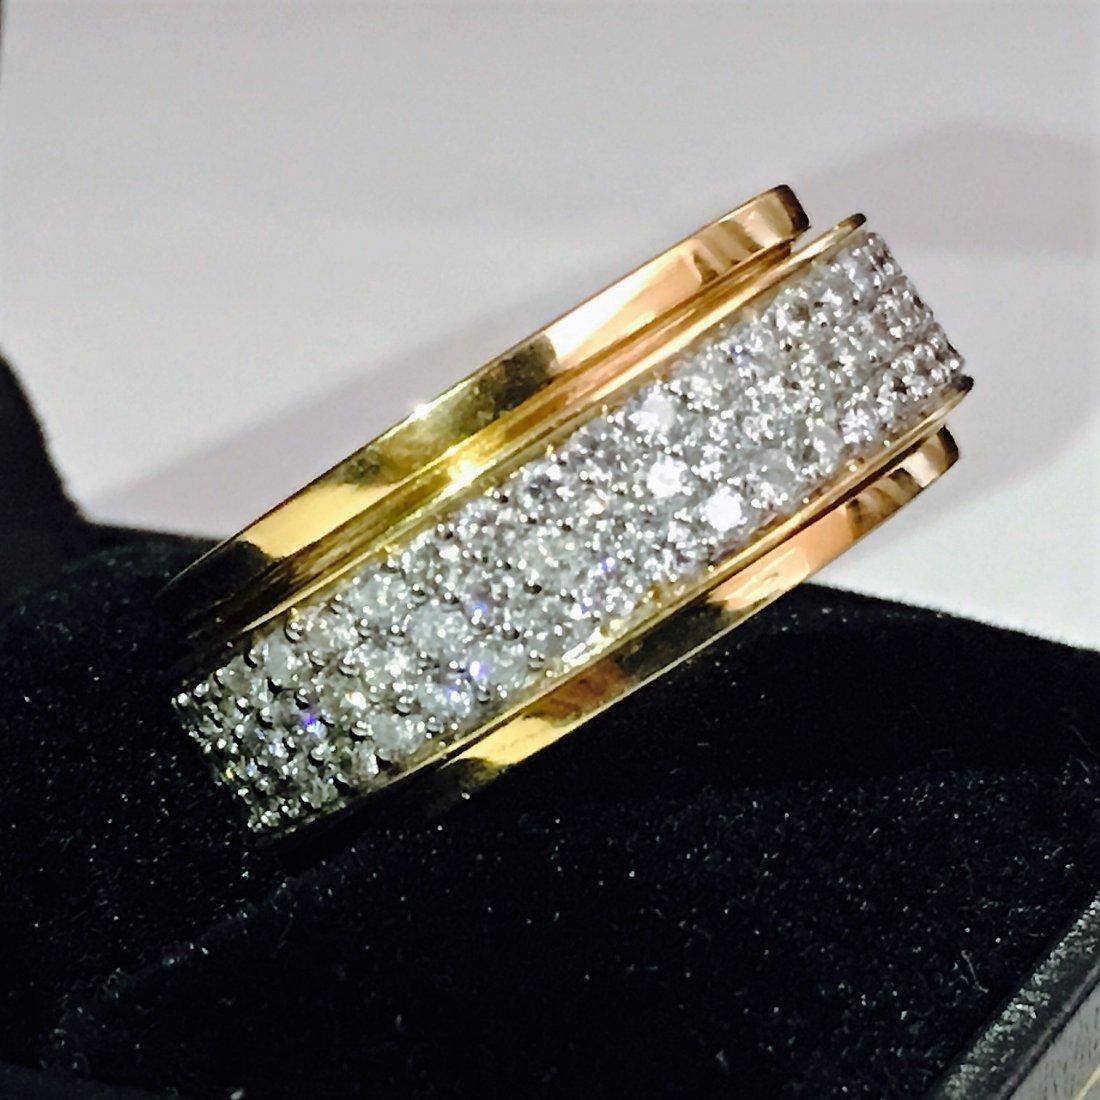 18k Yellow Gold, 4.50 Carat VVS Diamond Ring - 2